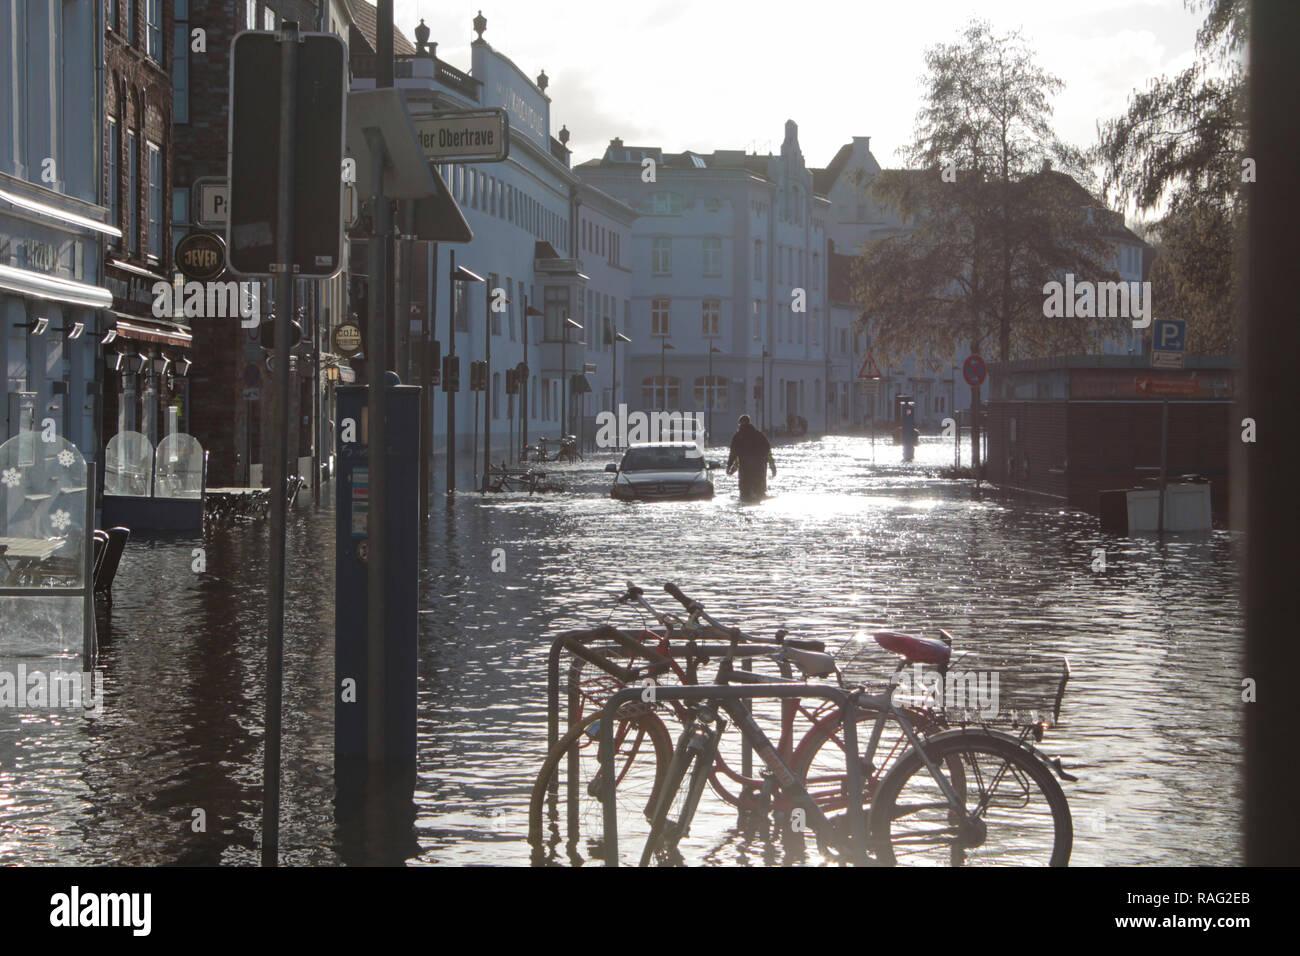 En Lübeck Hochwasser 2.1.19 Foto de stock